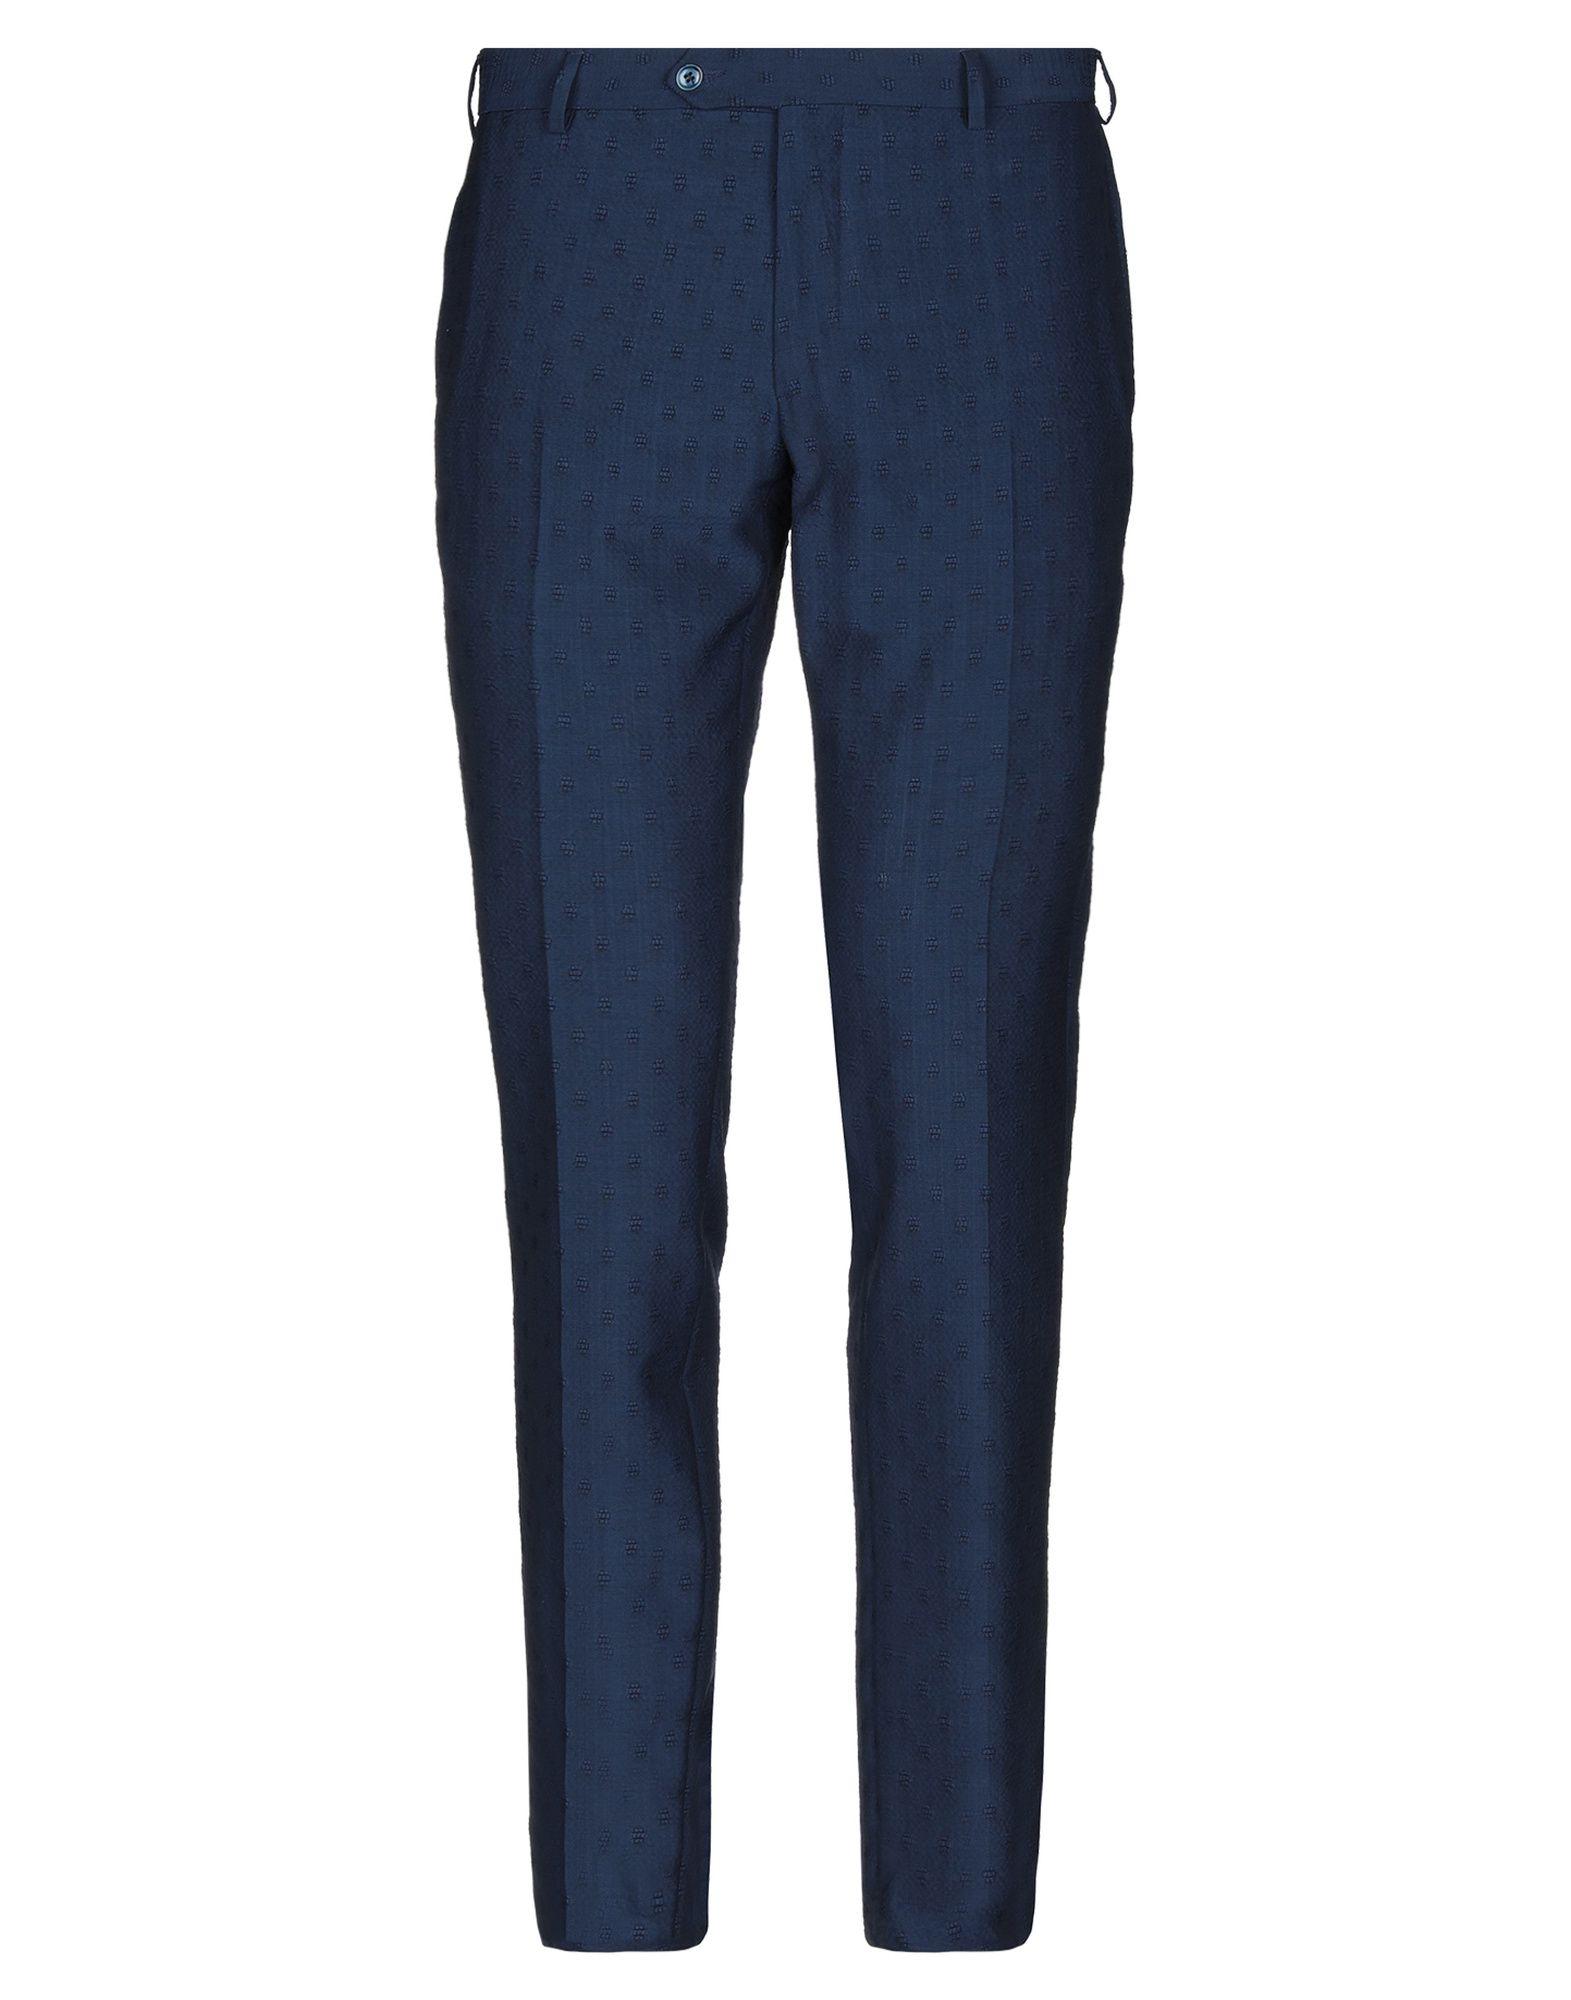 GIO ZUBON Повседневные брюки брюки чинос quelle quelle 920895